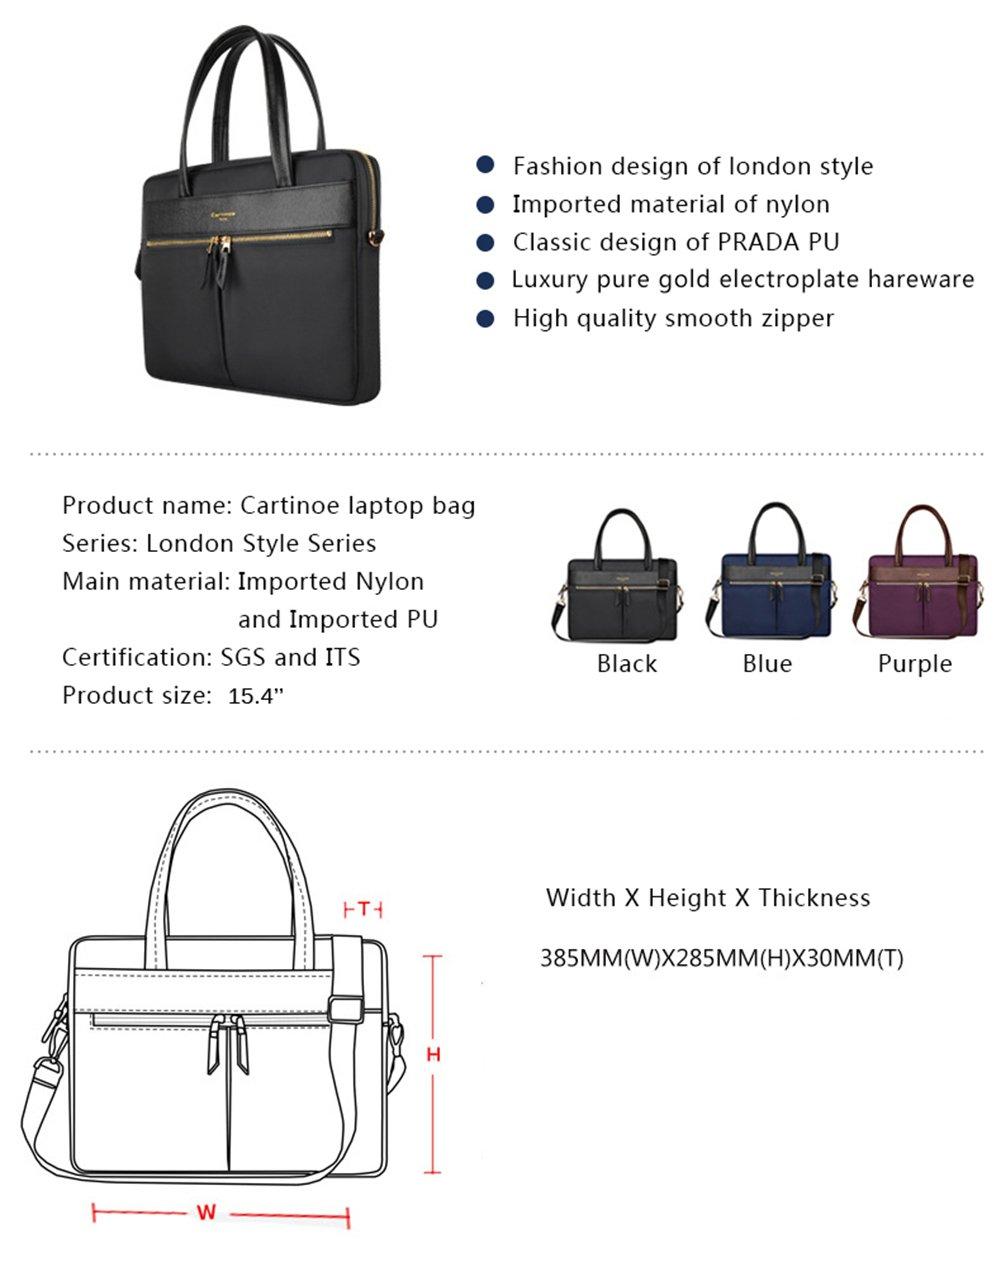 59ebed8b28aa Amazon.com: yiyinoe Luxury Ultrathin Laptop Bag for 14 15 inch MacBook  Ultrabook,Special Business Briefcase for Women,Sleek Fabric,Metallic  Zipper,Black: ...